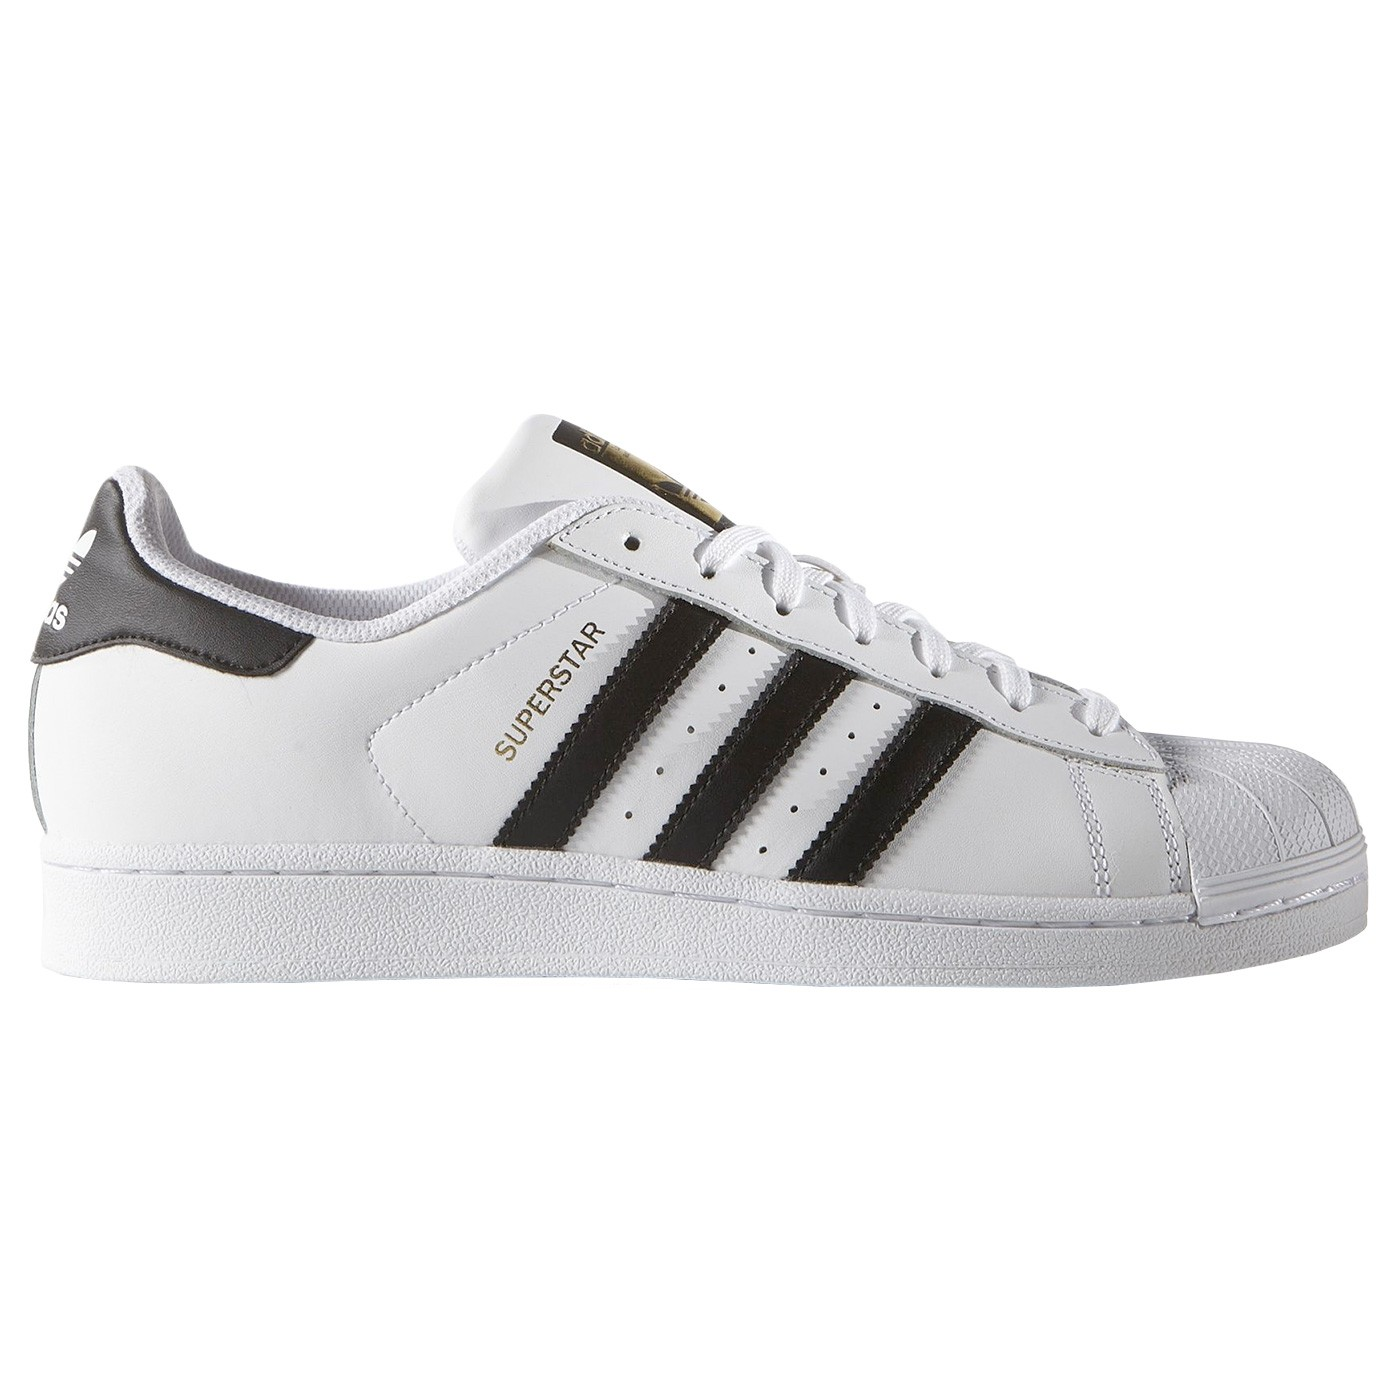 meilleure sélection 3857b dea62 Sneakers Adidas Superstar white-black